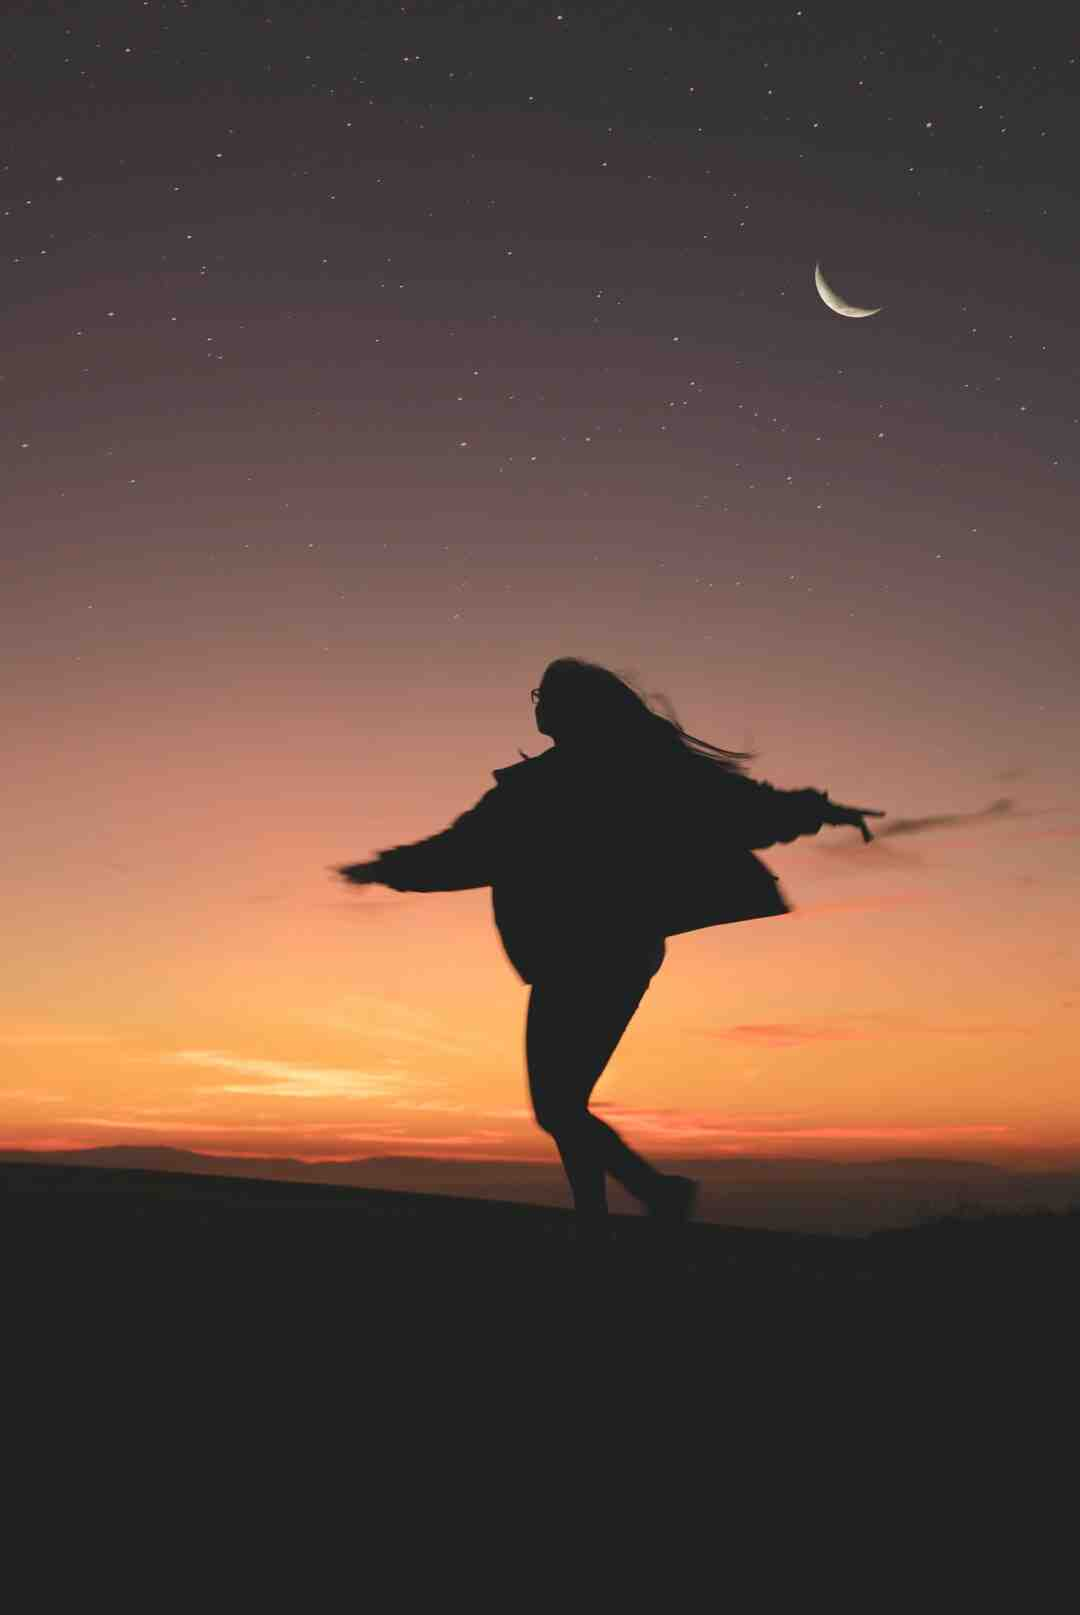 Danse : Ndem Comment apprendre à danser